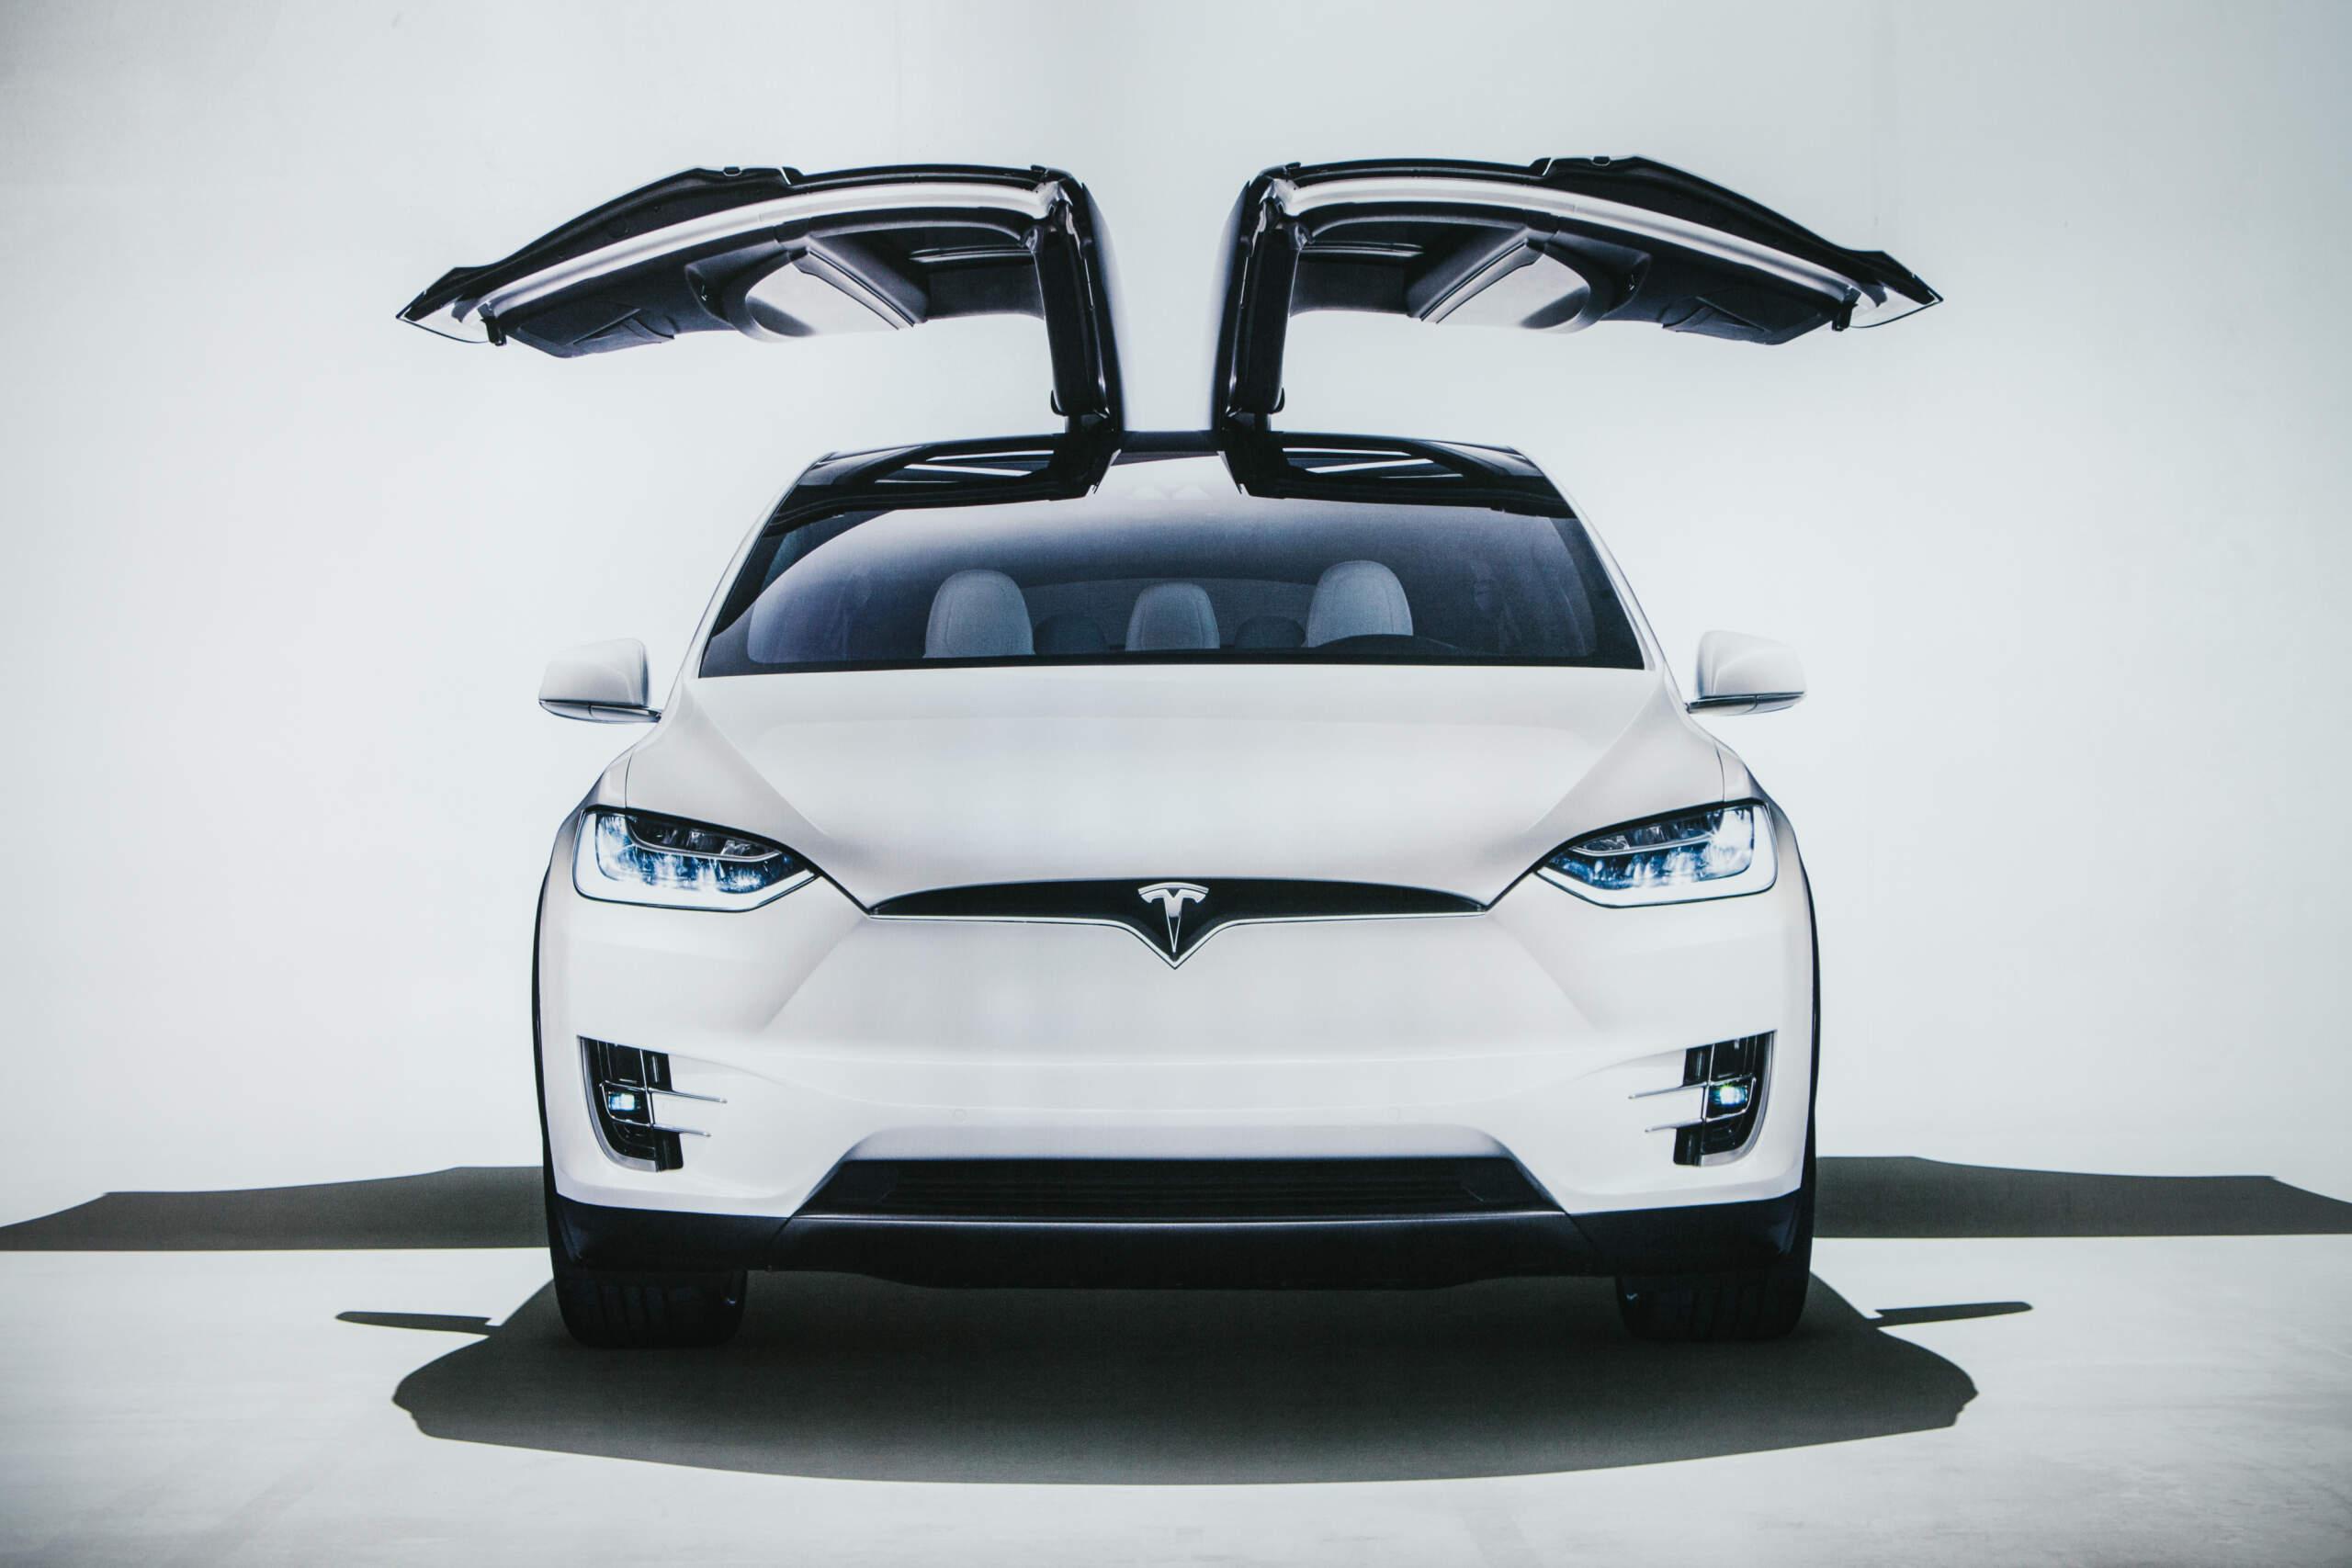 Tesla Recalls 9,500 Vehicles Over Faulty Roofs